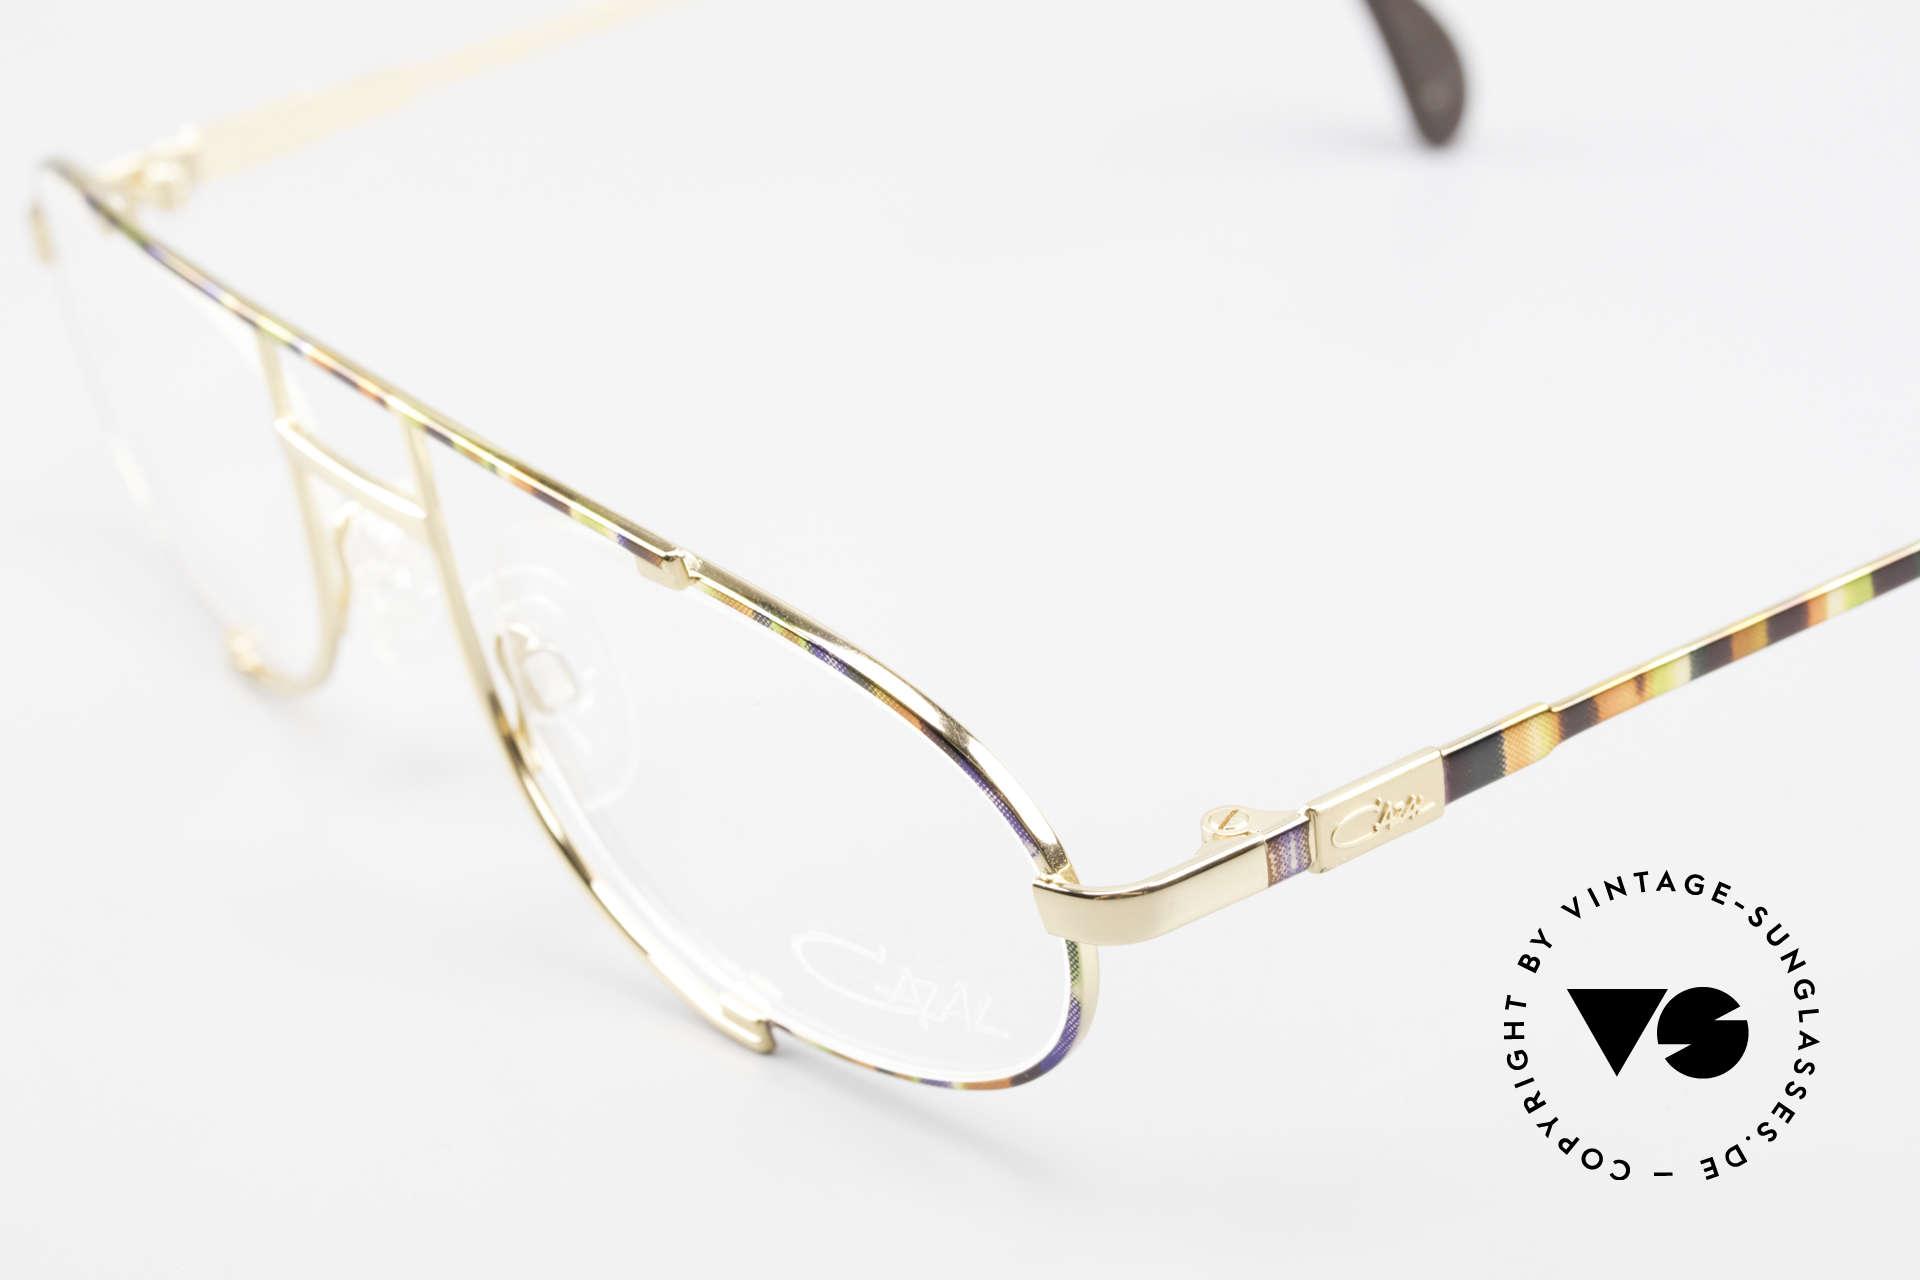 Cazal 753 Rare 1990's Designer Glasses, high-grade craftsmanship (frame made in Germany), Made for Men